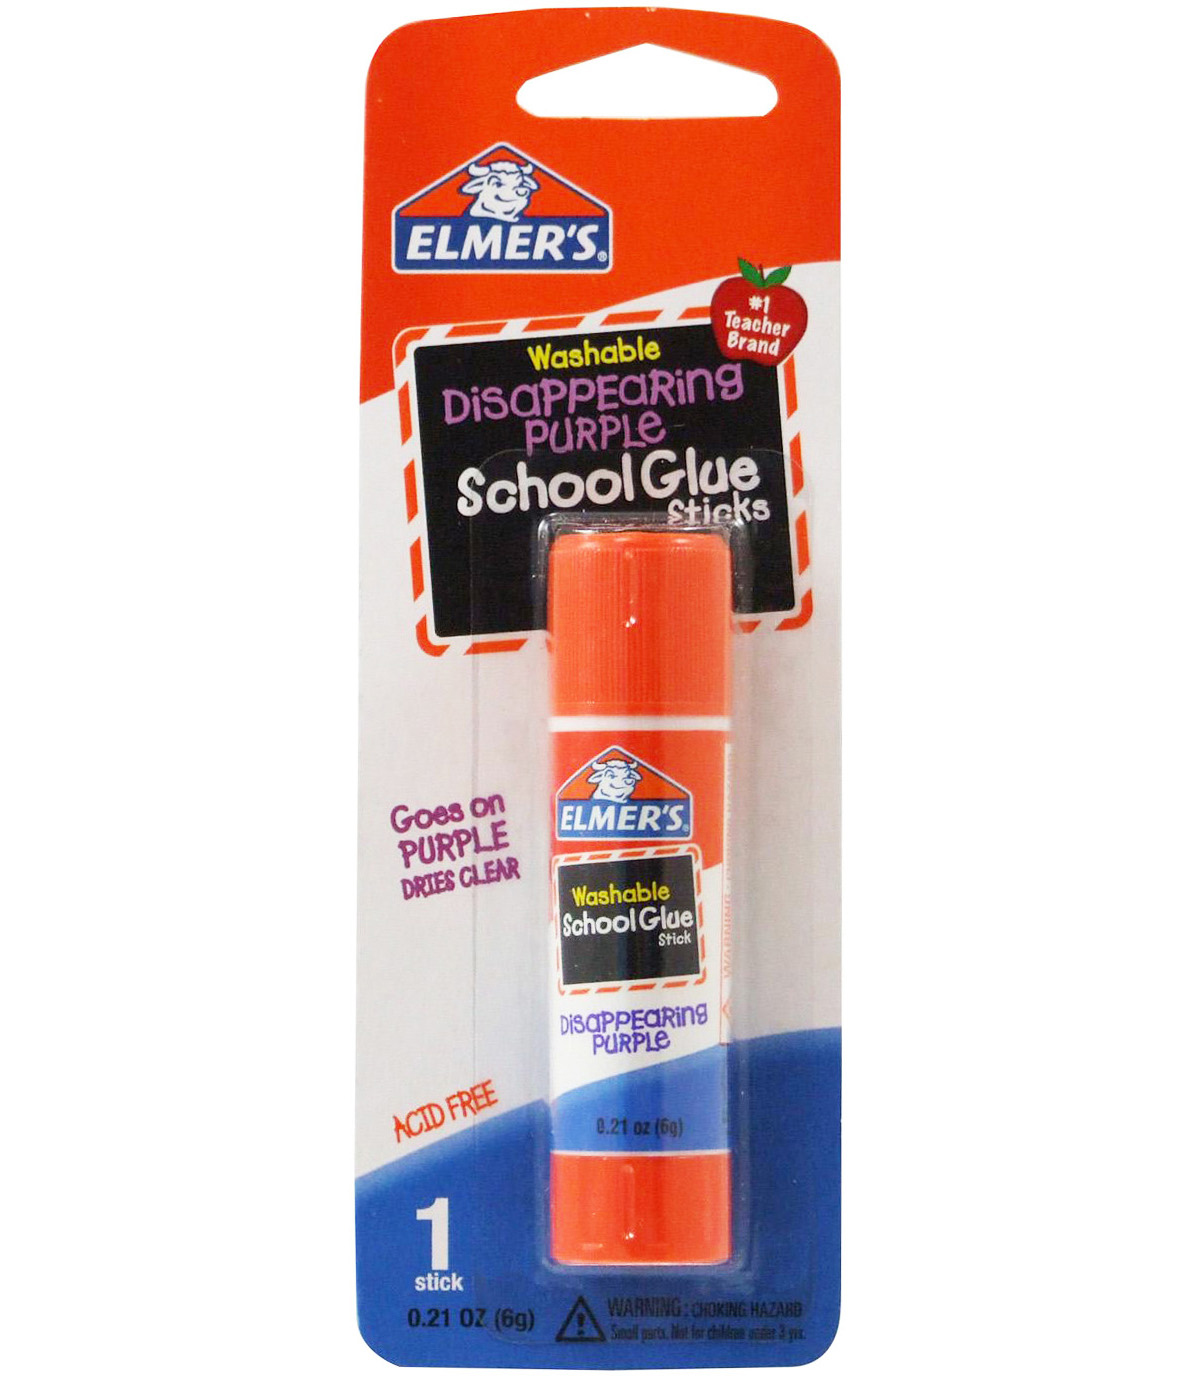 Elmer's Washable School Glue Stick - Purple-.21oz